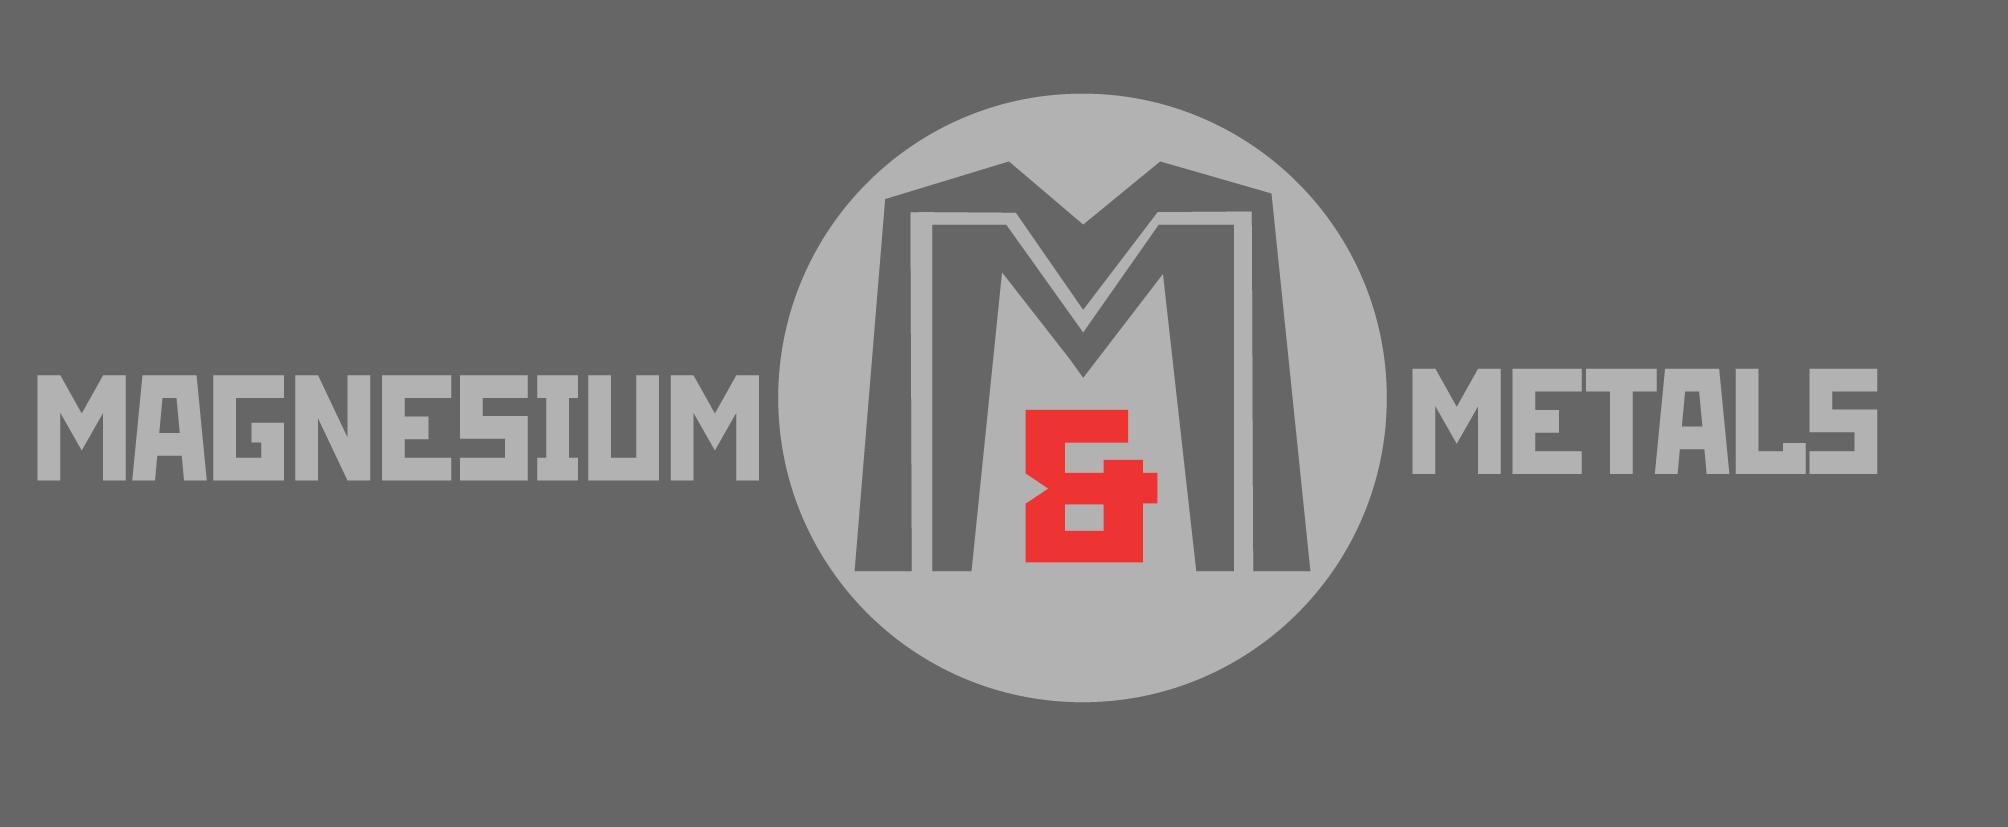 Логотип для проекта Magnesium&Metals фото f_4e7b4901ae2a7.jpg